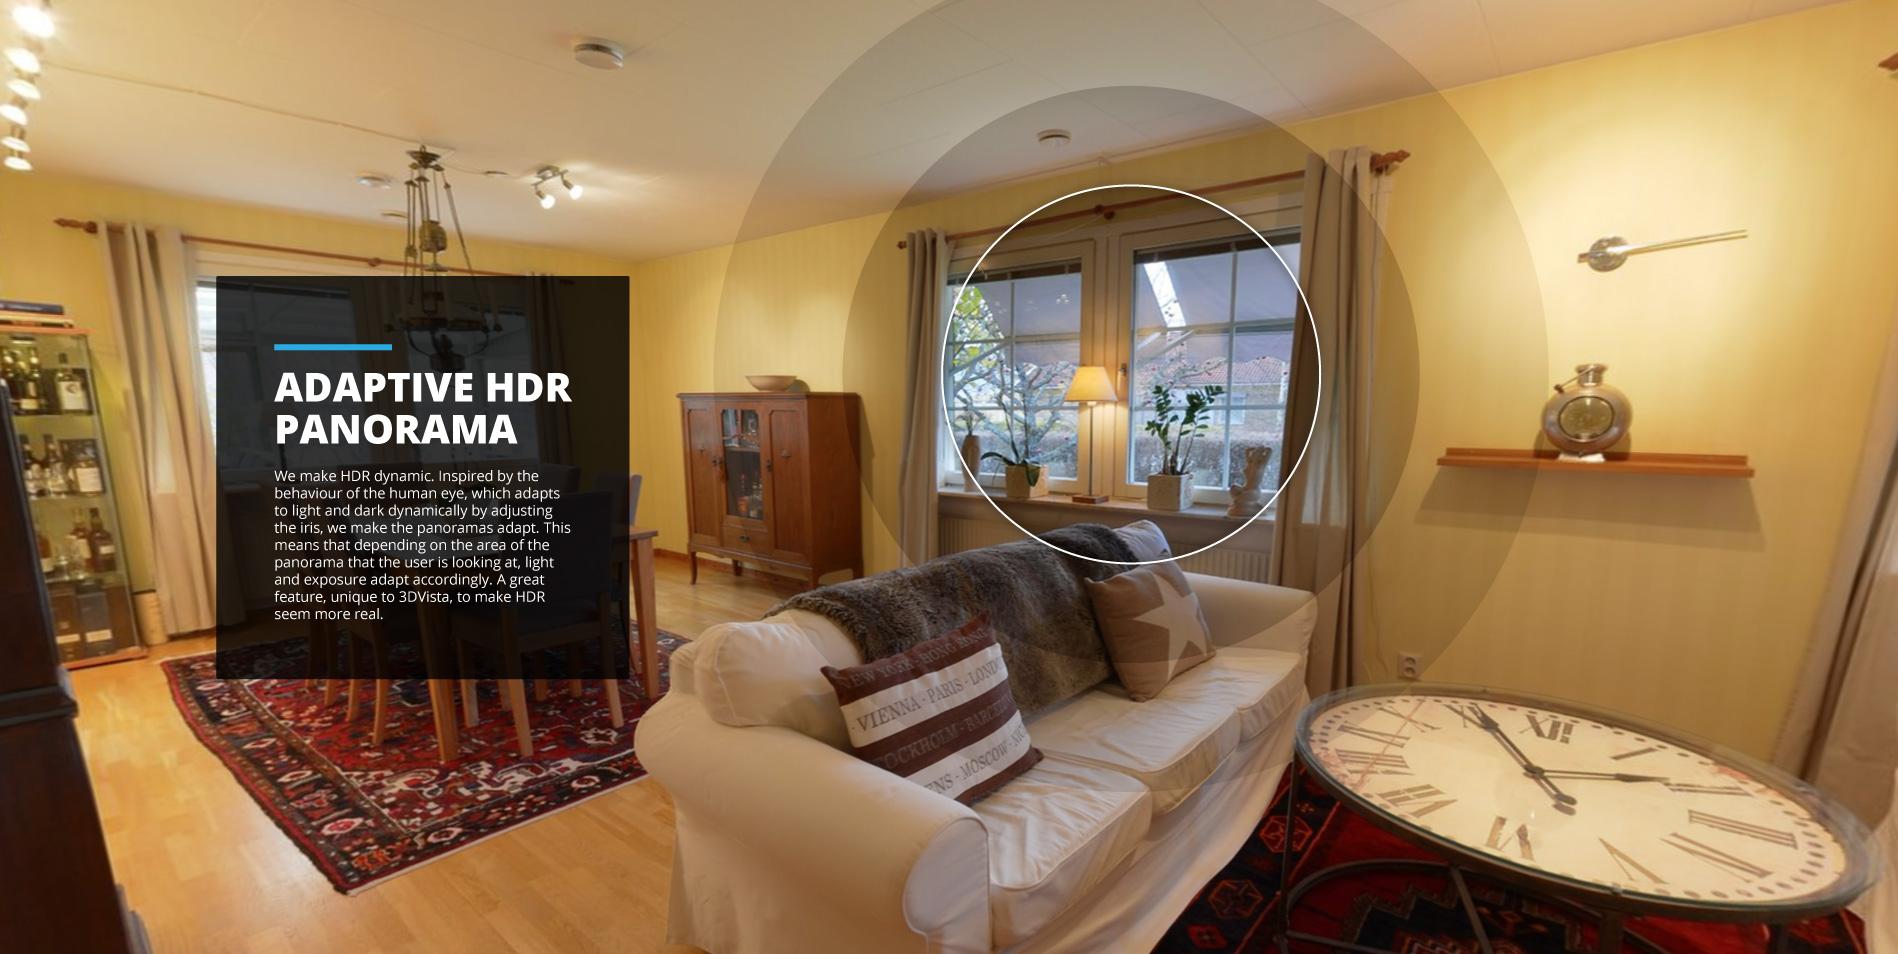 Live Panoramas y Panoramas HDR Adaptativos con Cámaras 360º